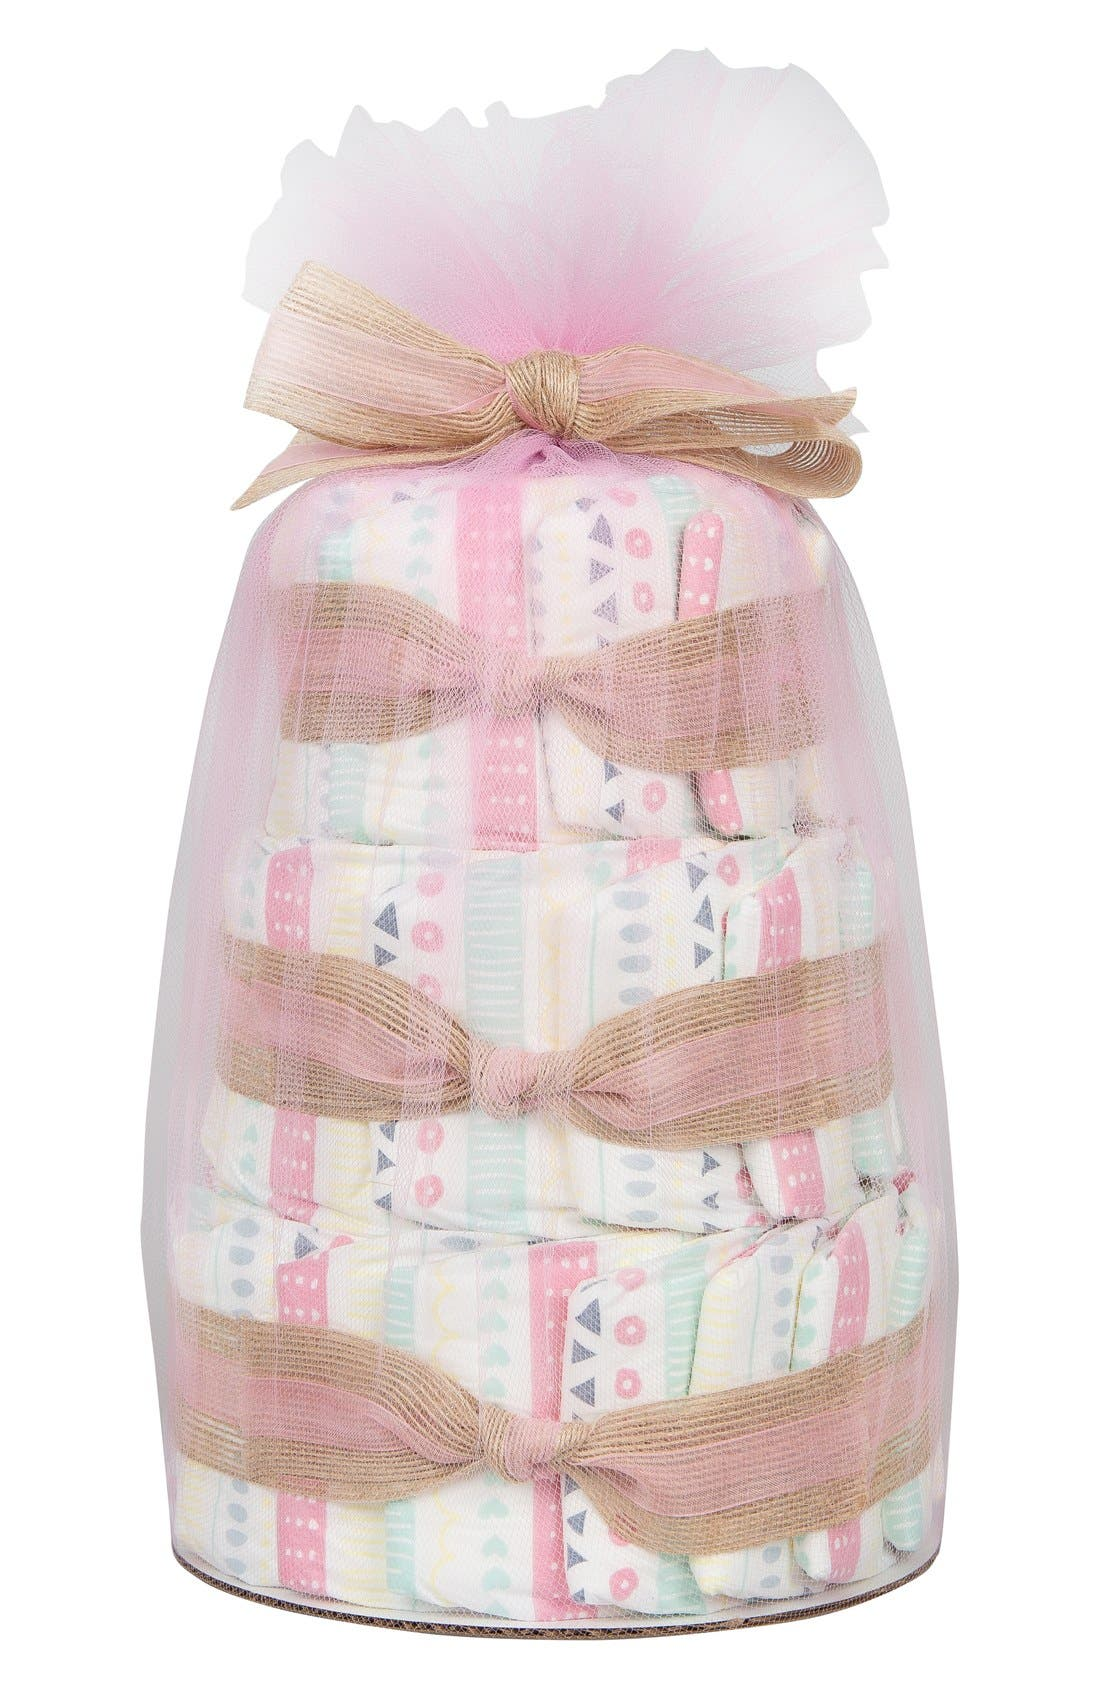 Mini Diaper Cake & Travel-Size Essentials Set,                             Main thumbnail 6, color,